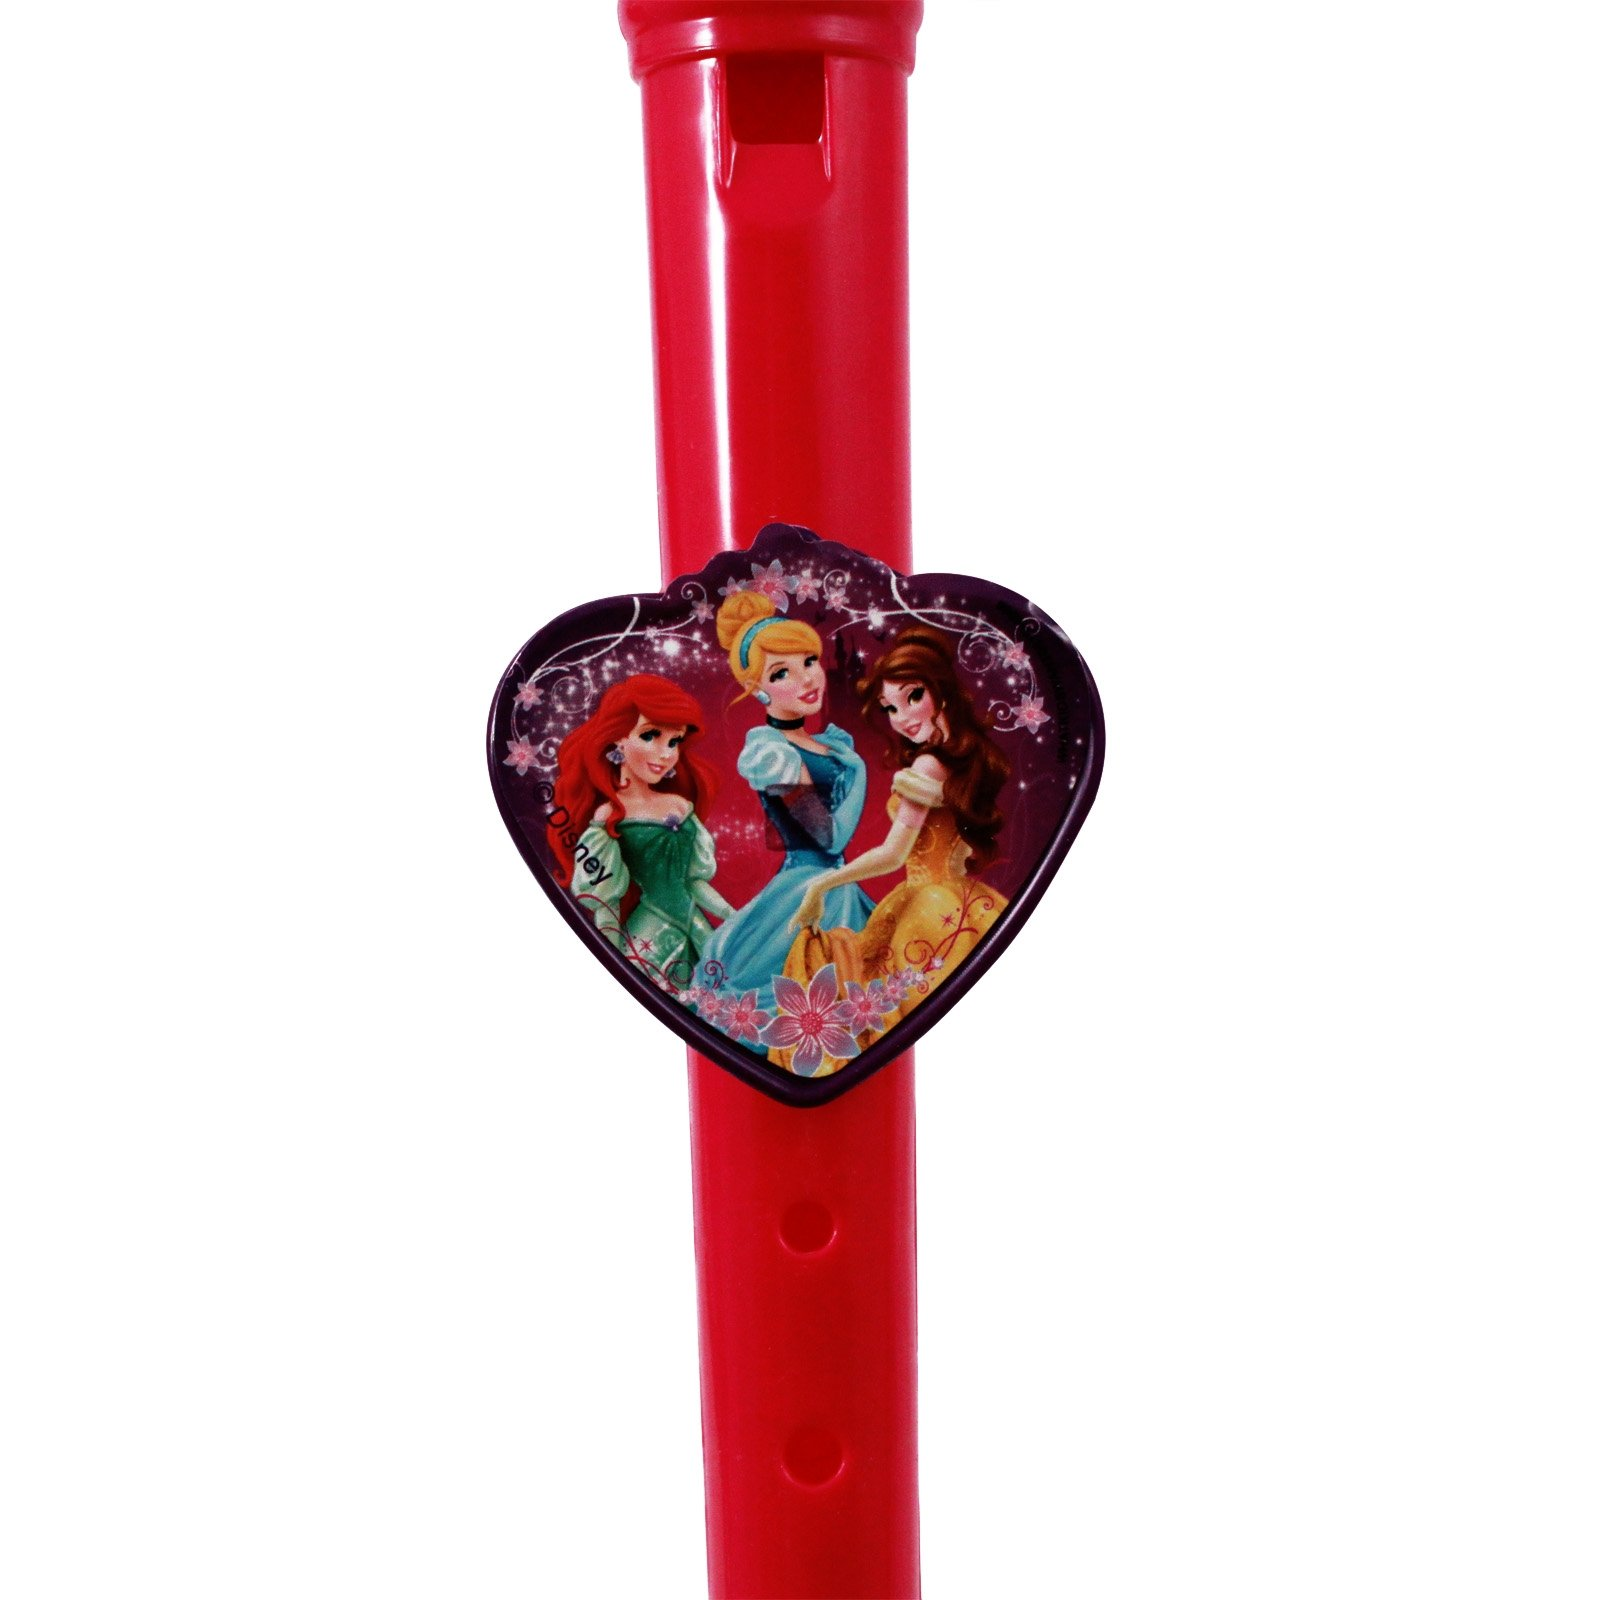 Disney Princess Music Instrument Flute Recorder Girls Toy Pink